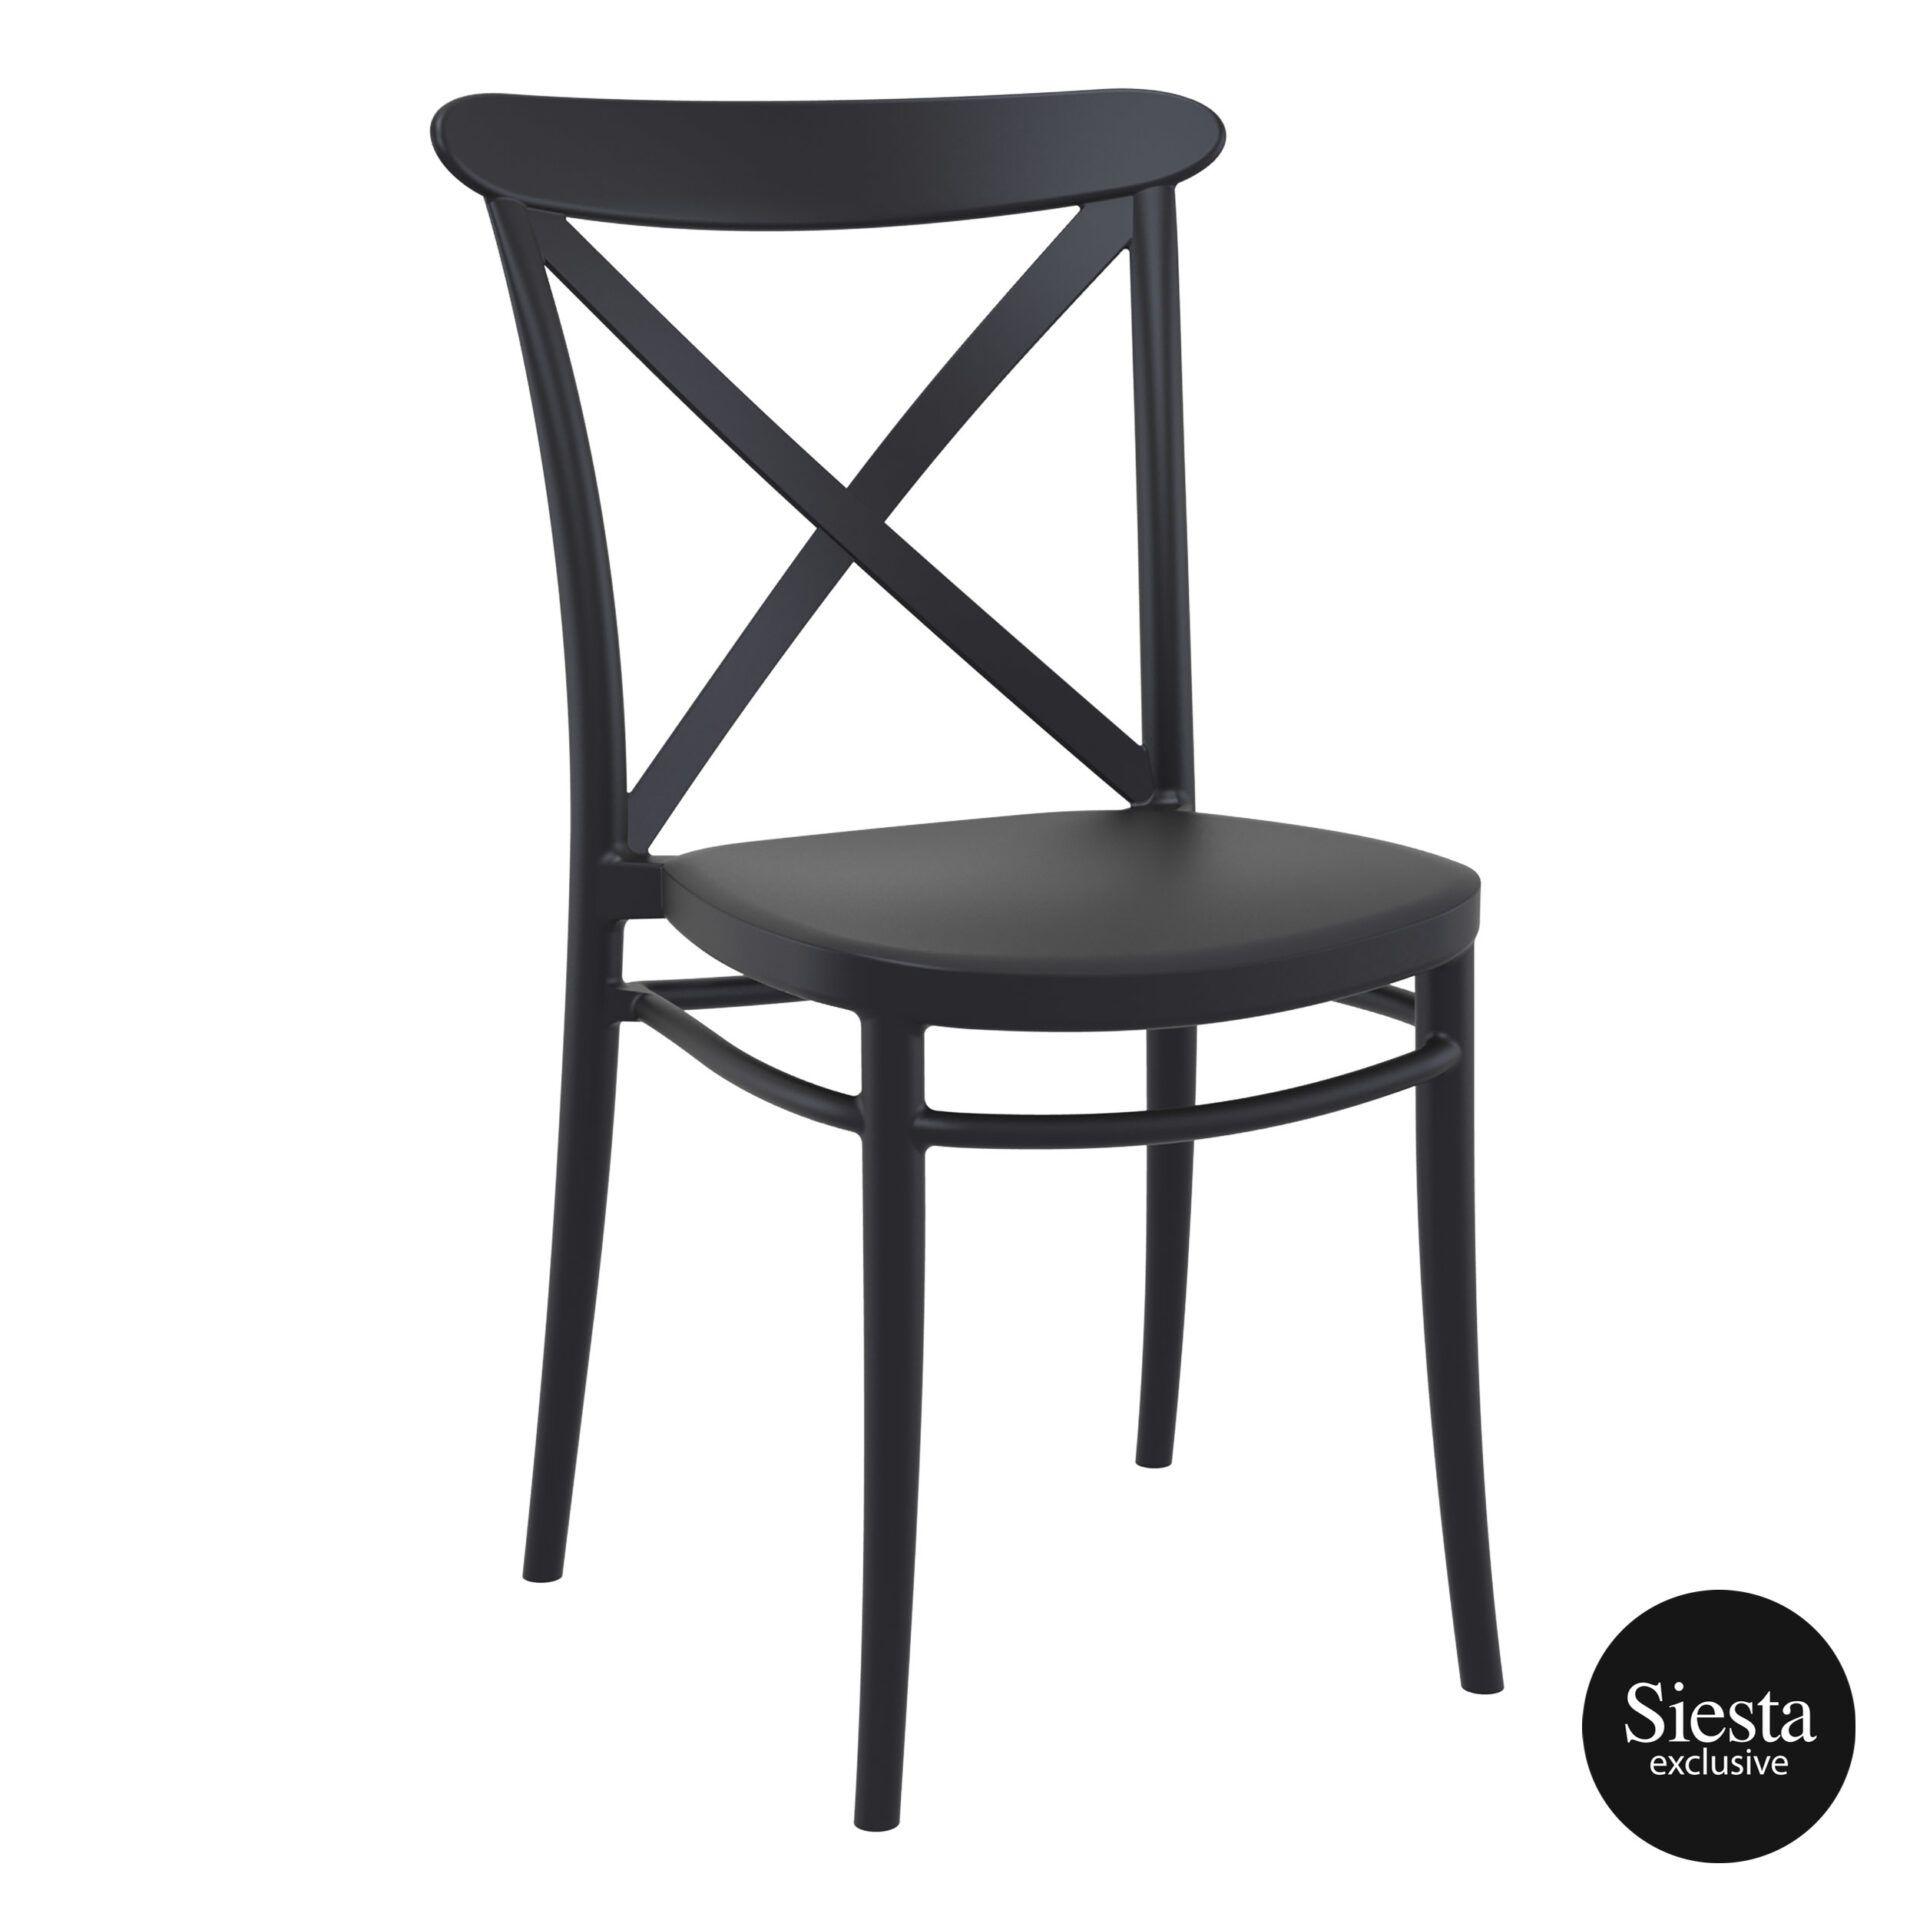 cafe polypropylene cross chair black front side 1 1